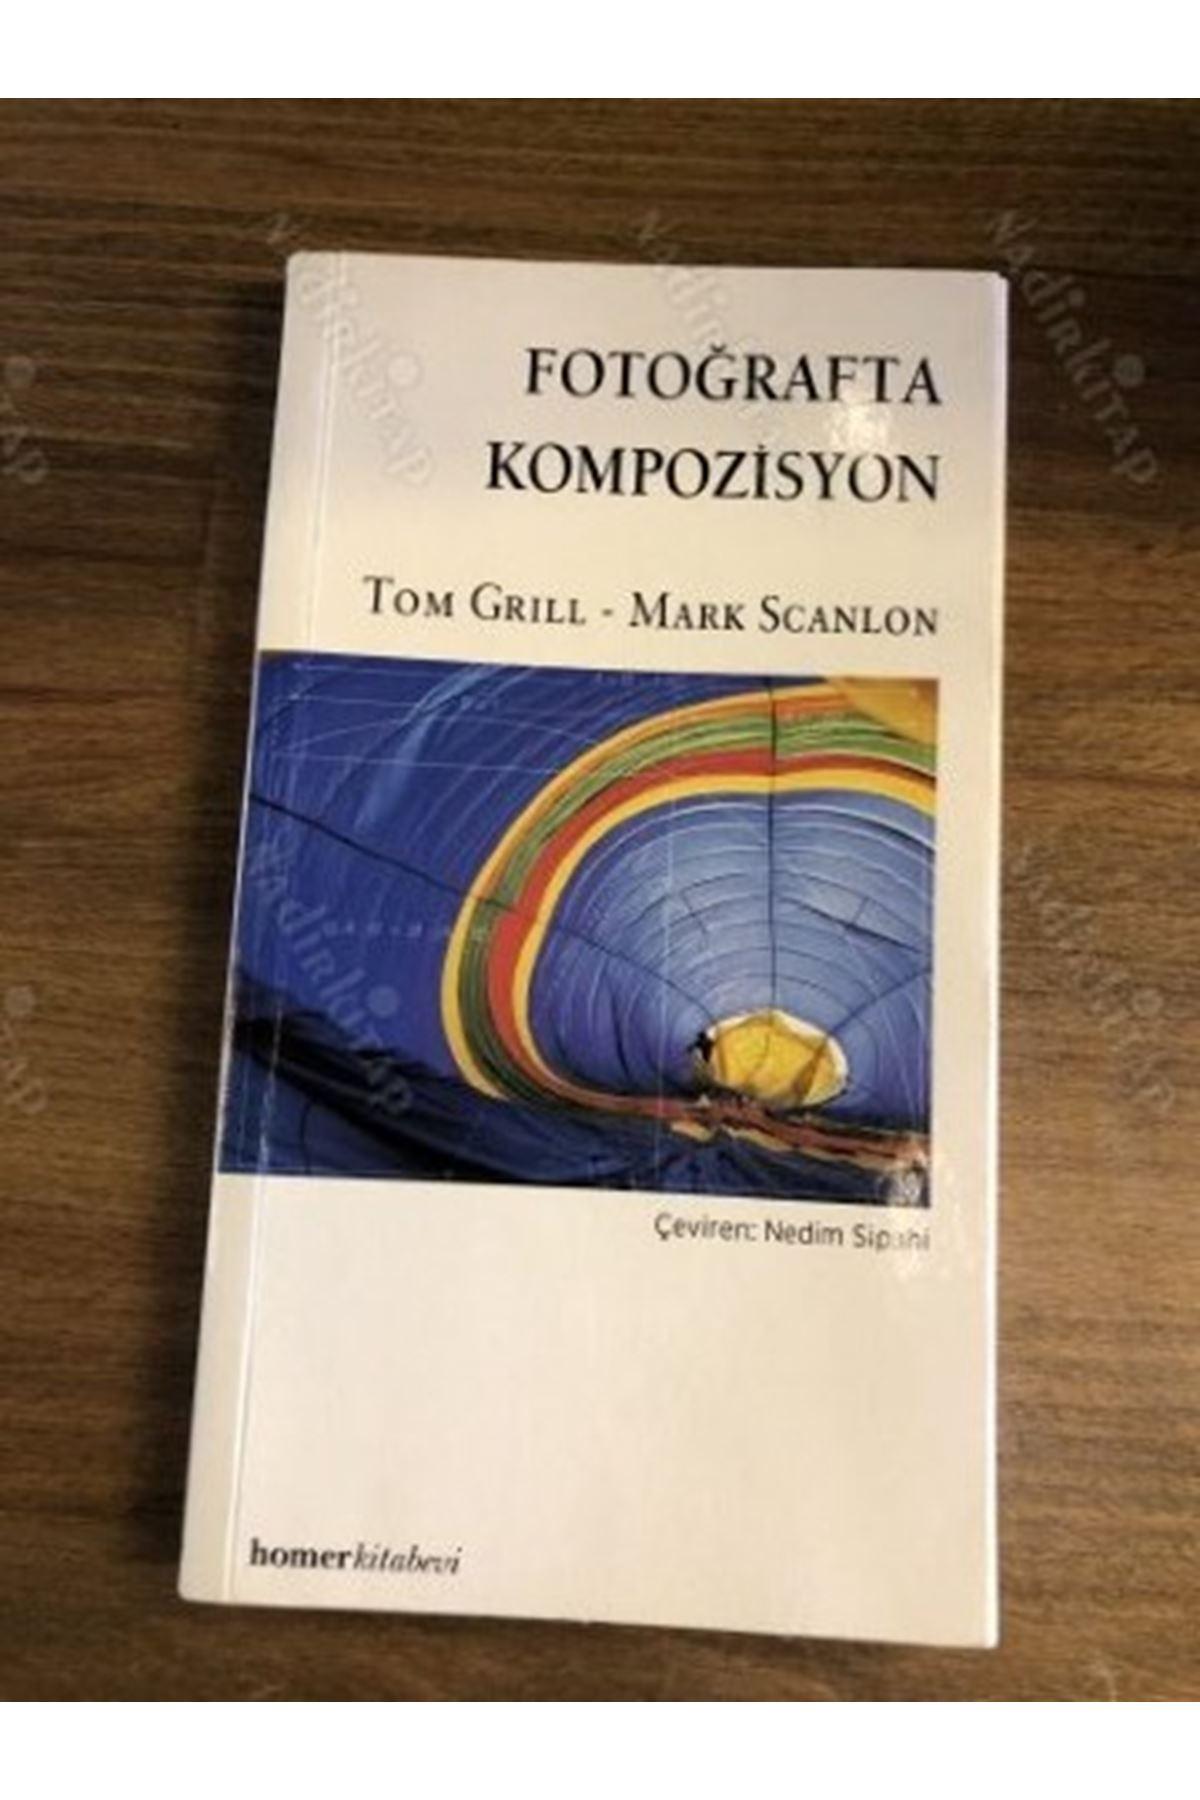 TOM GRILL - FOTOĞRAFTA KOMPOZİSYON